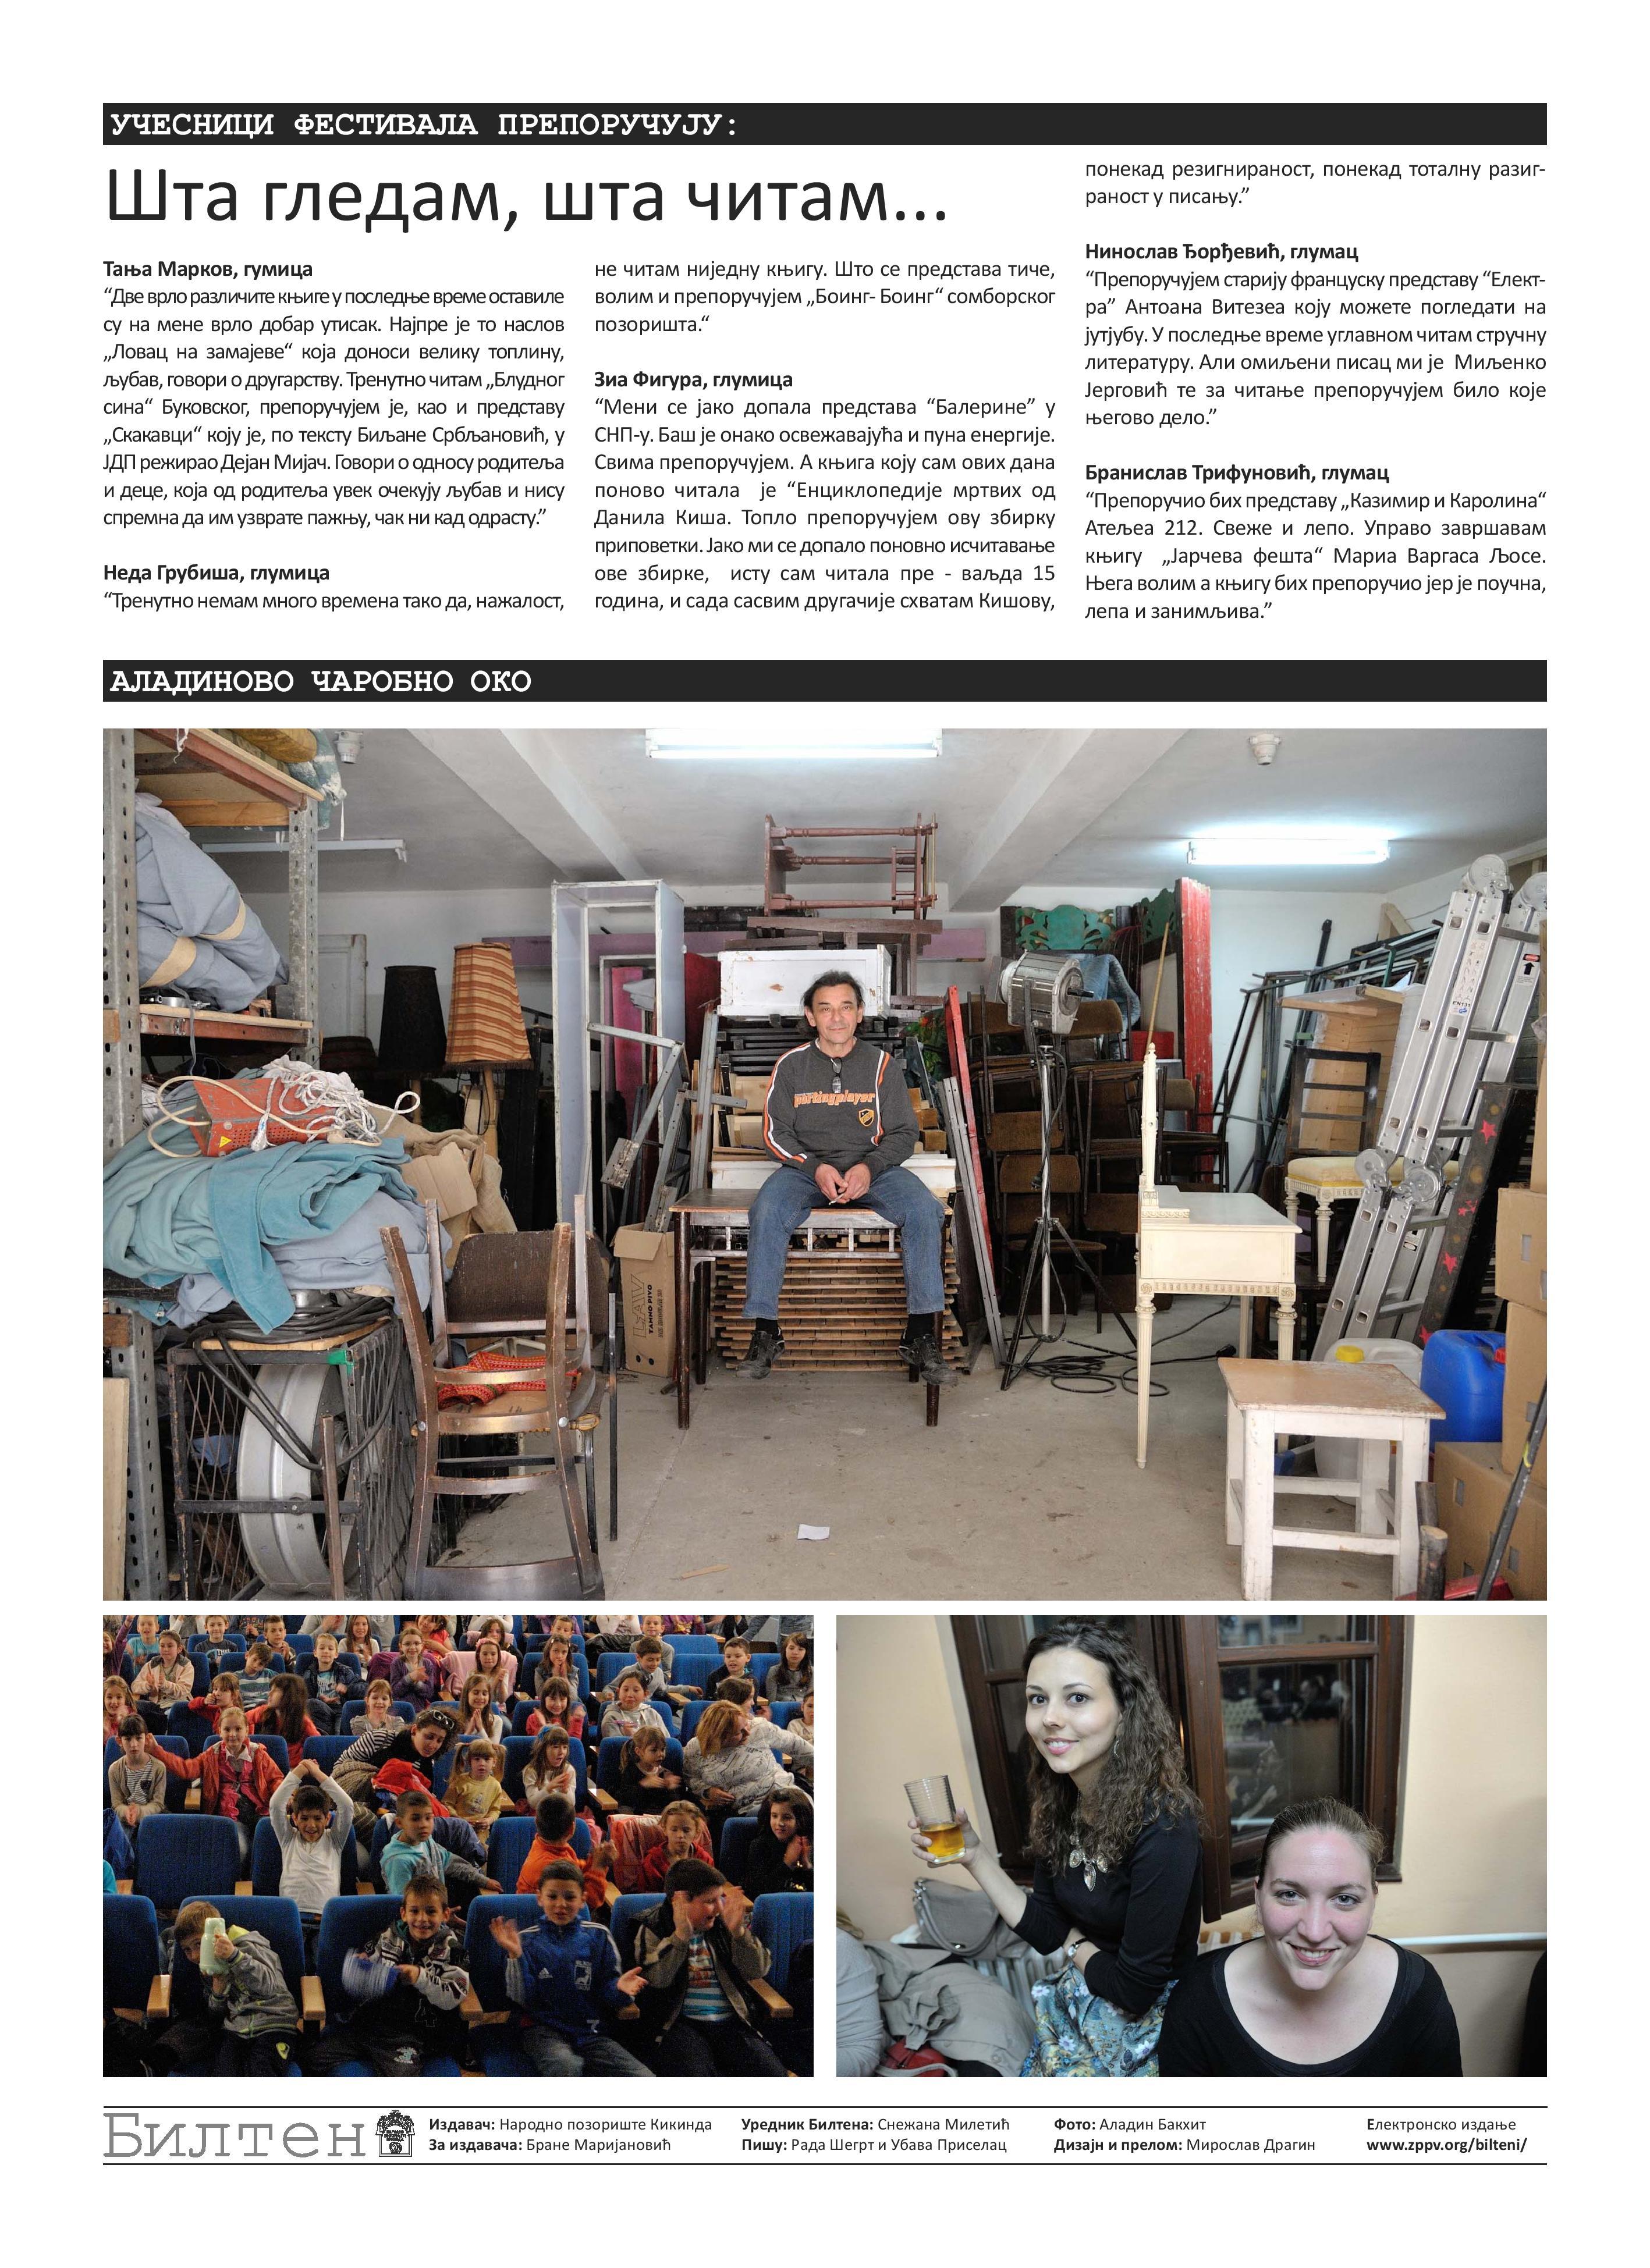 BILTEN_06_25 april-page-009